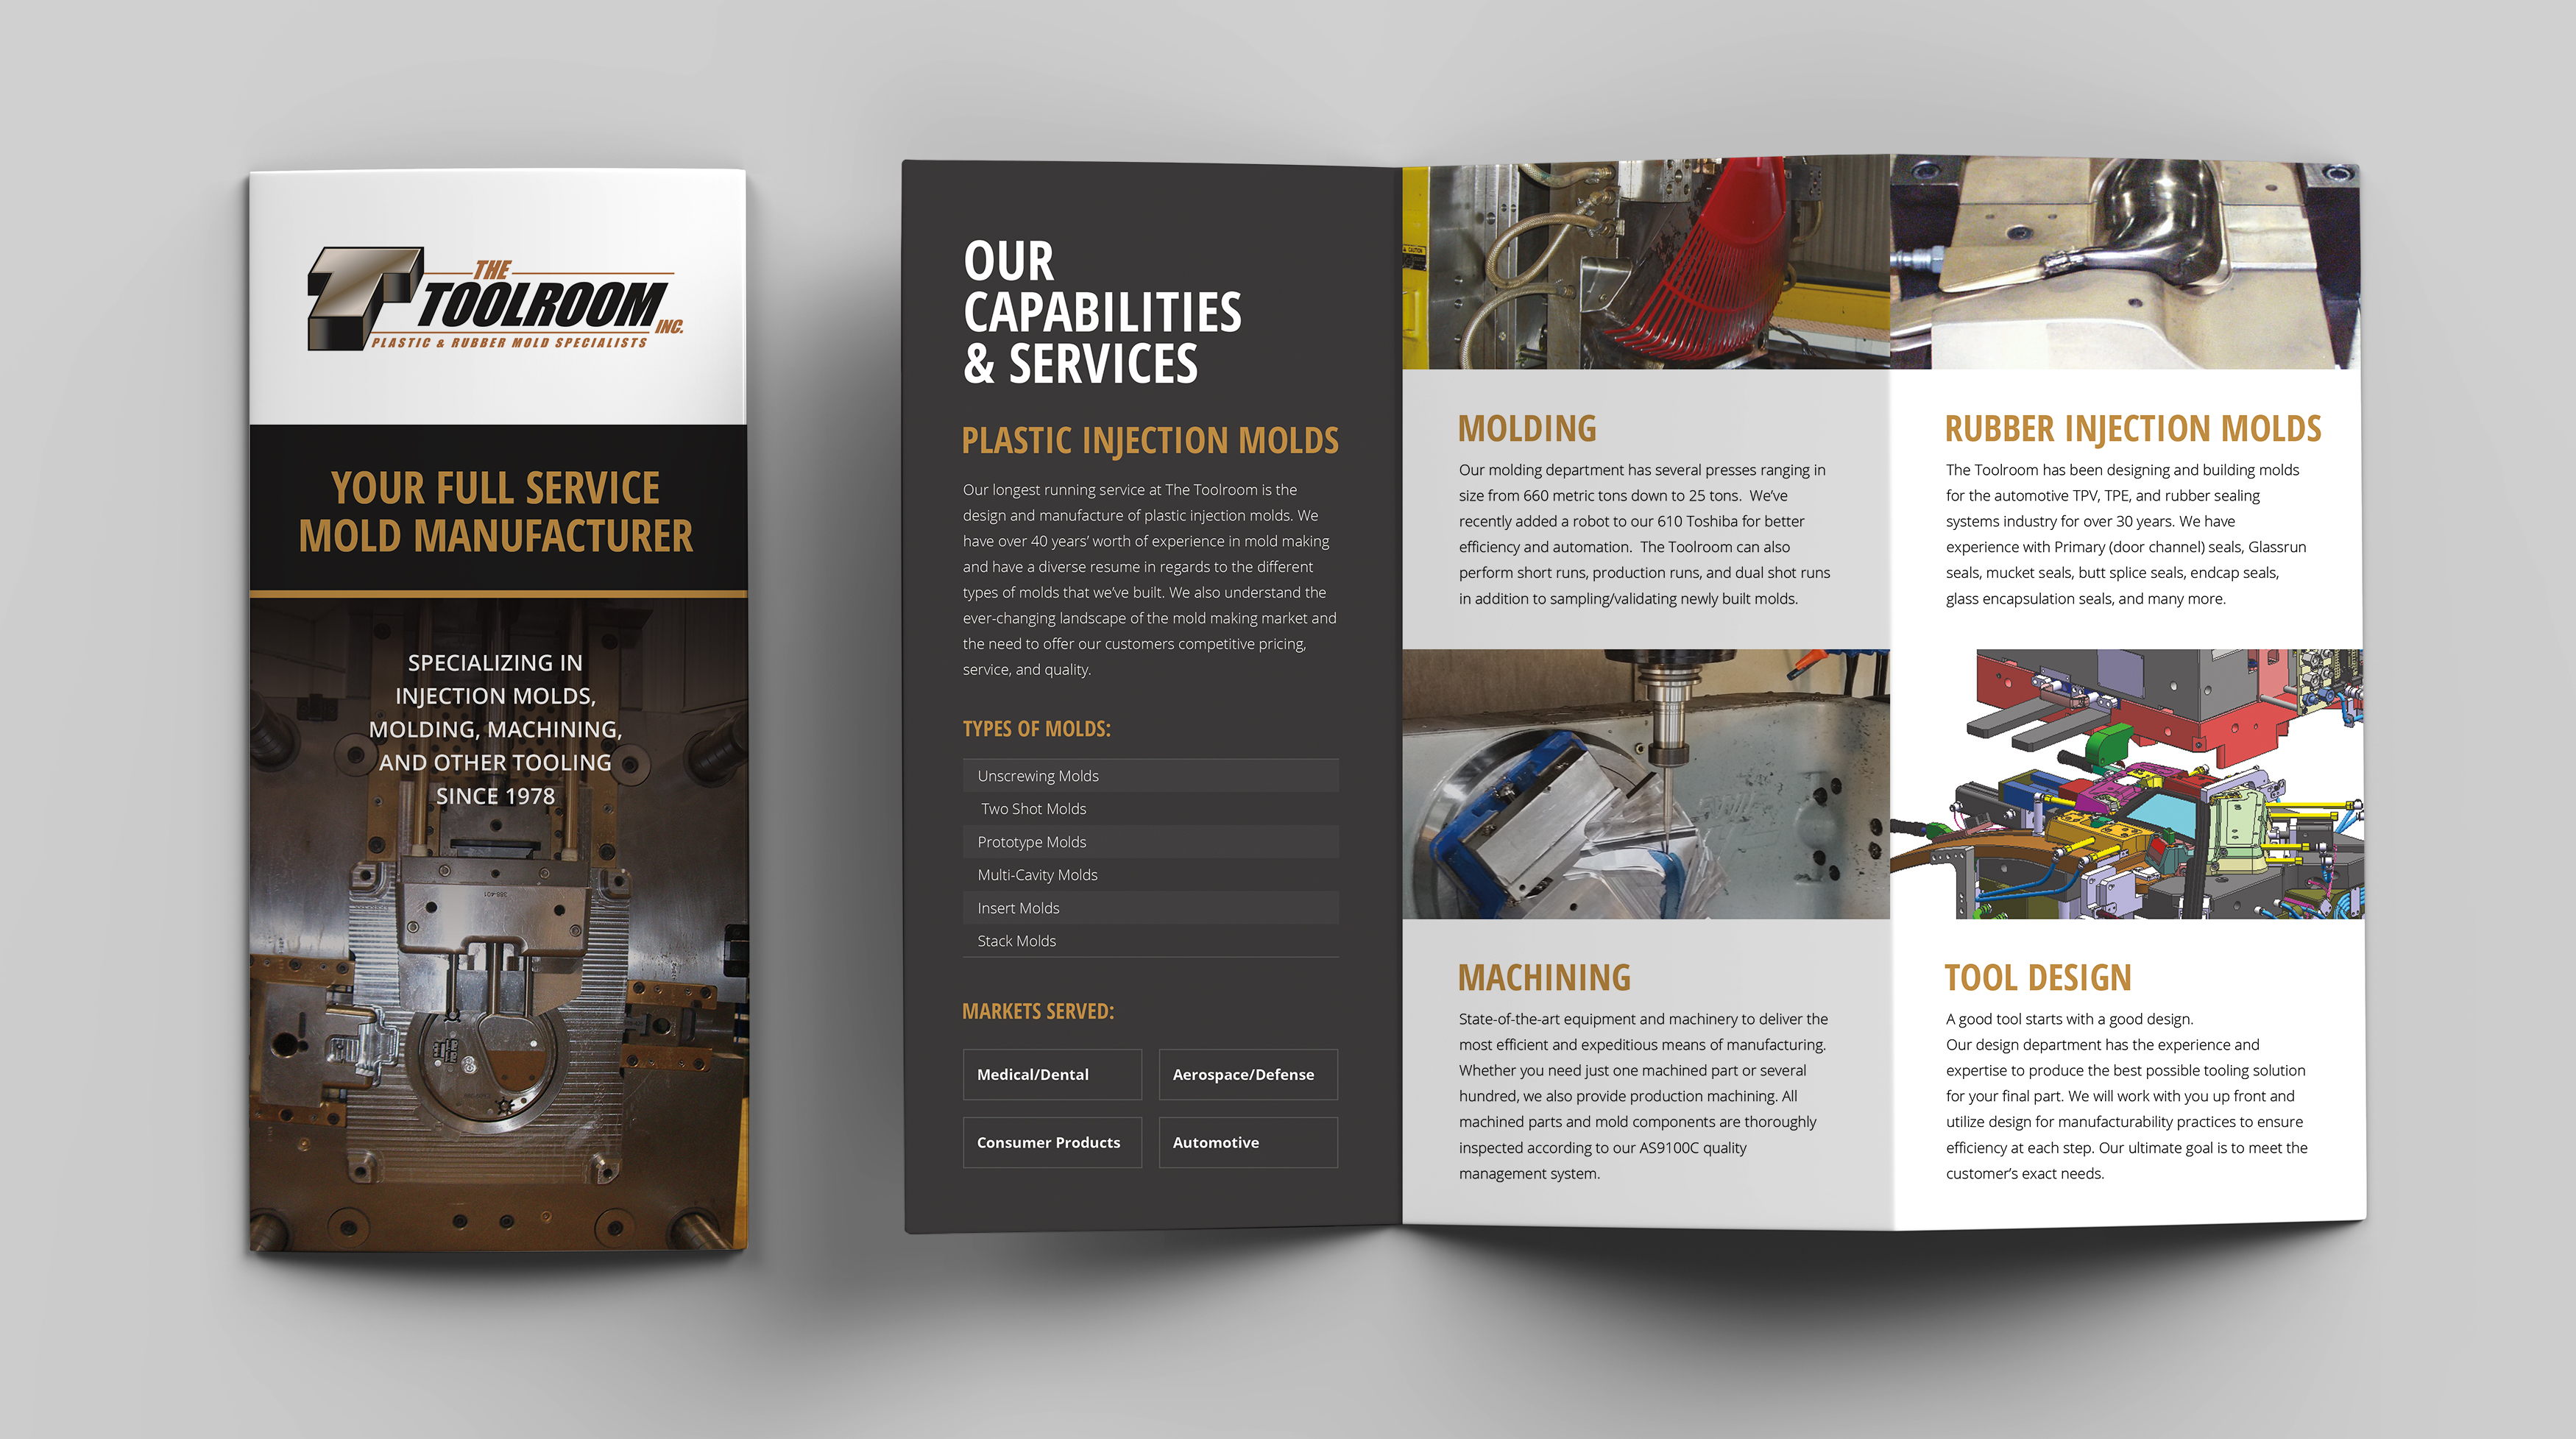 full-service-mold-manufacturer-st-louis-graphic-design